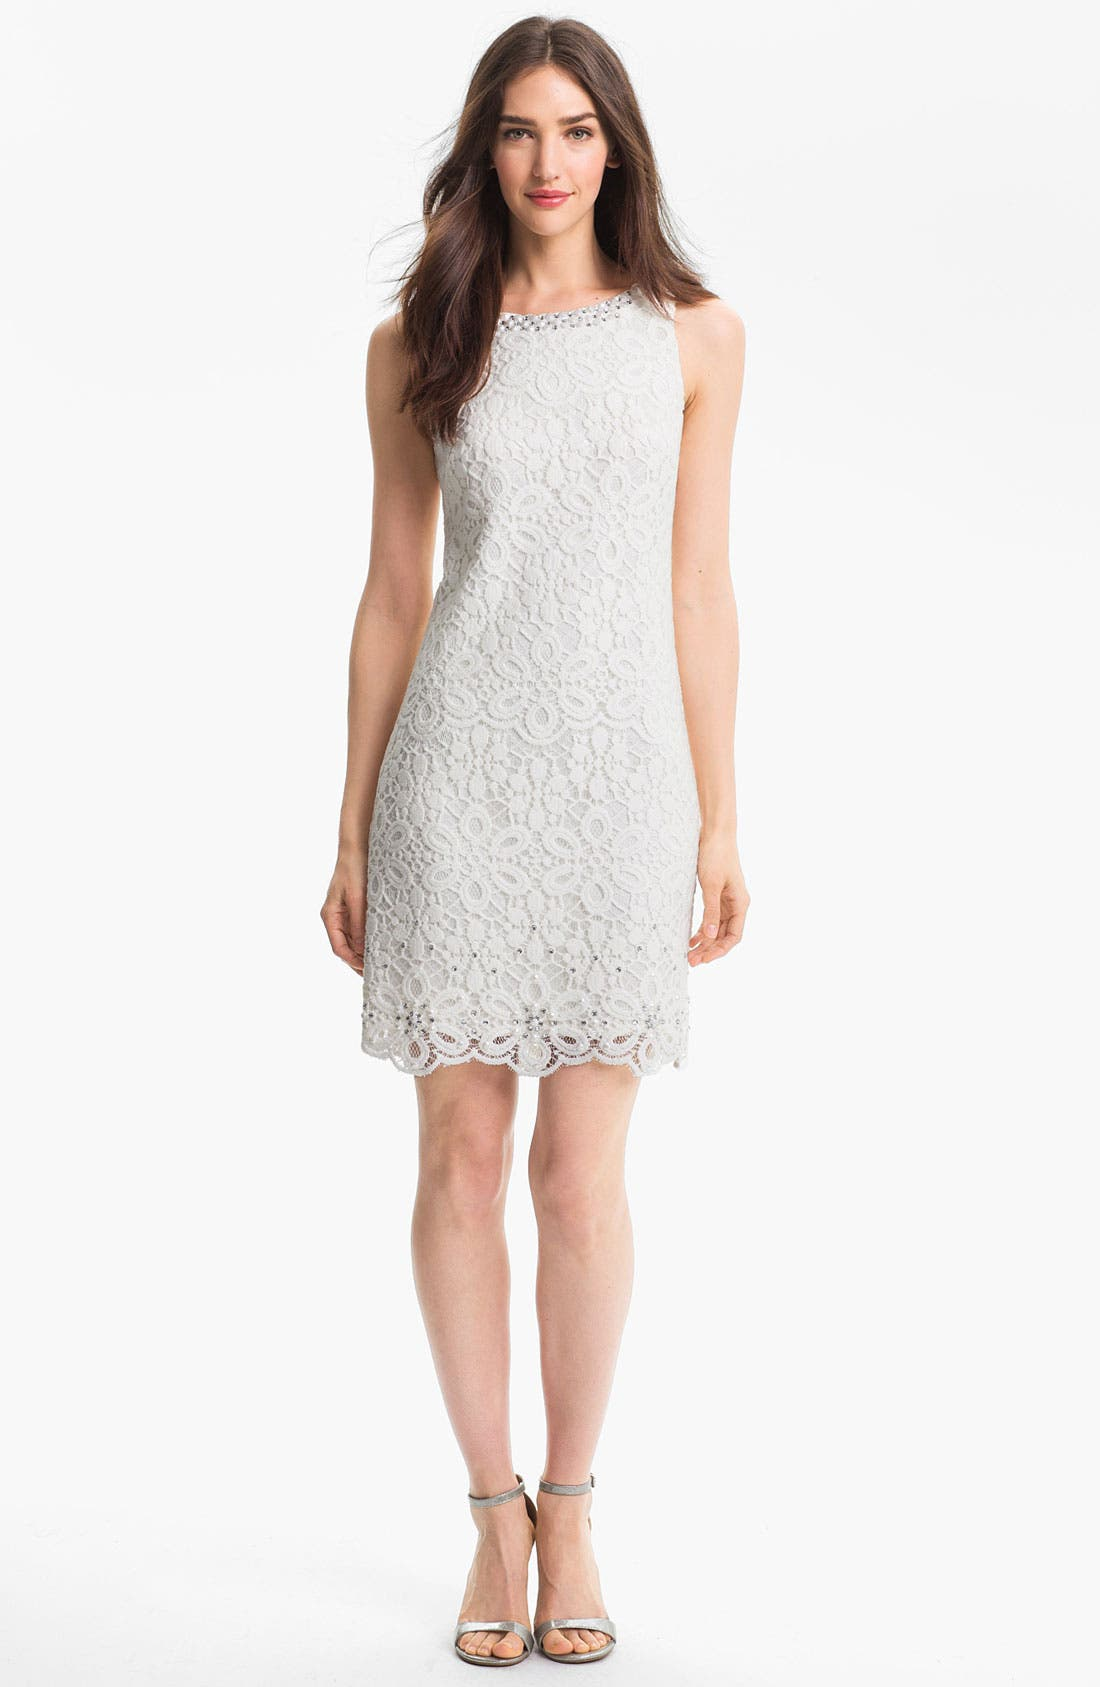 Main Image - Laundry by Shelli Segal Embellished Lace Dress